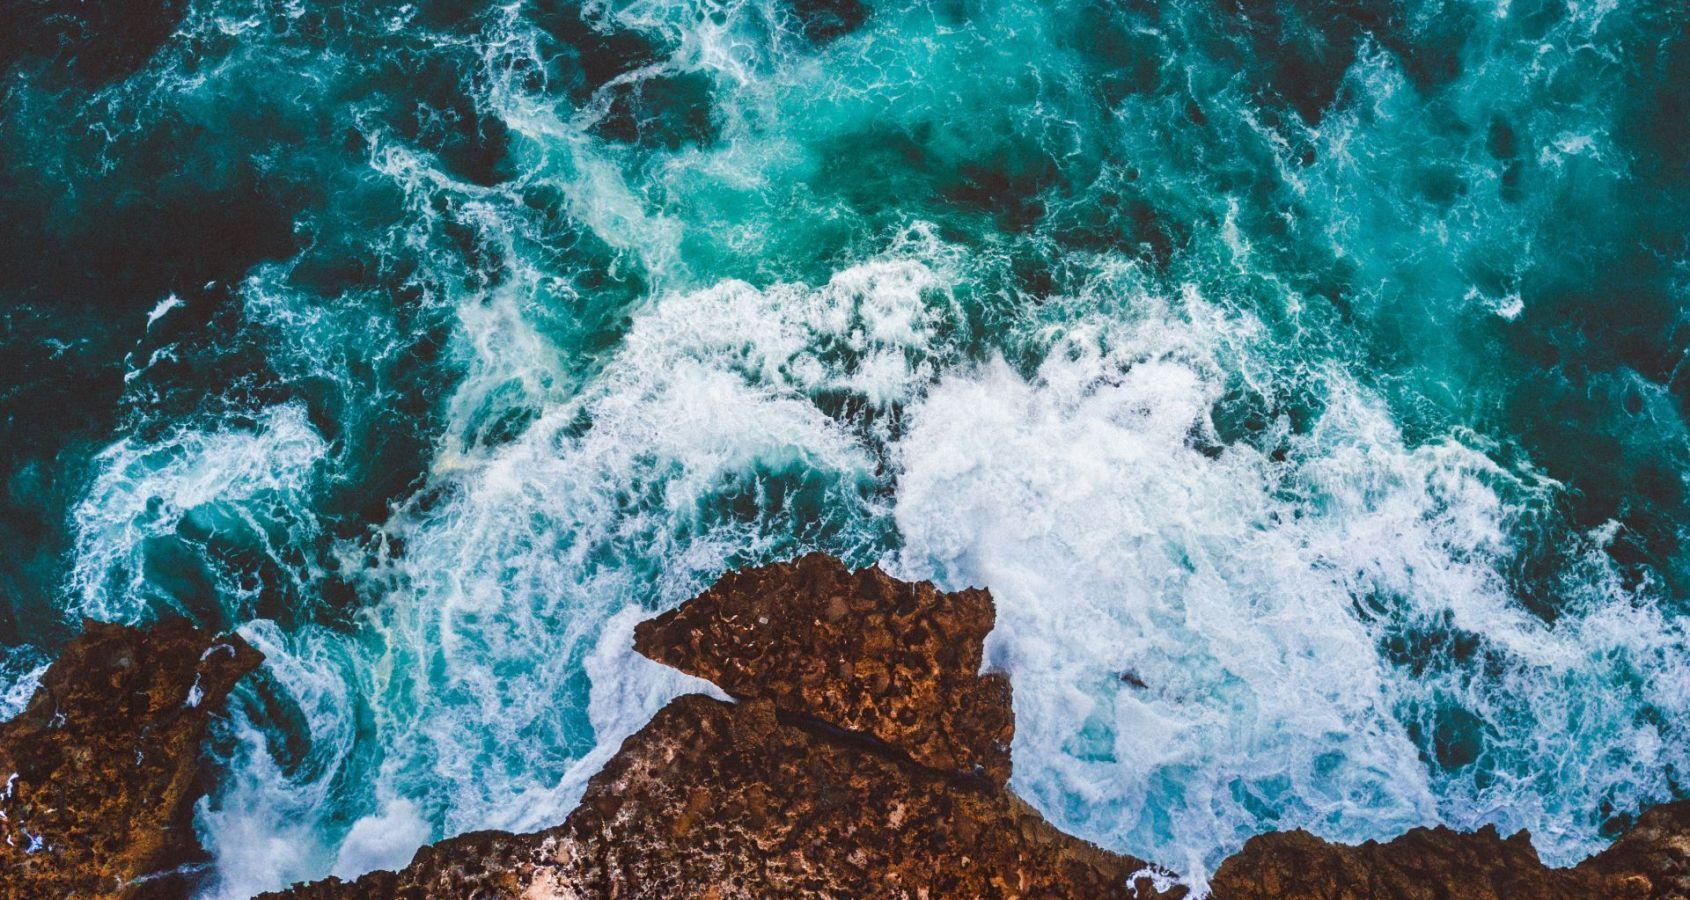 New Findings Suggest That Oceans Can Be Restored By 2050 Ocean Wallpaper Computer Wallpaper Desktop Wallpapers Laptop Wallpaper Desktop Wallpapers